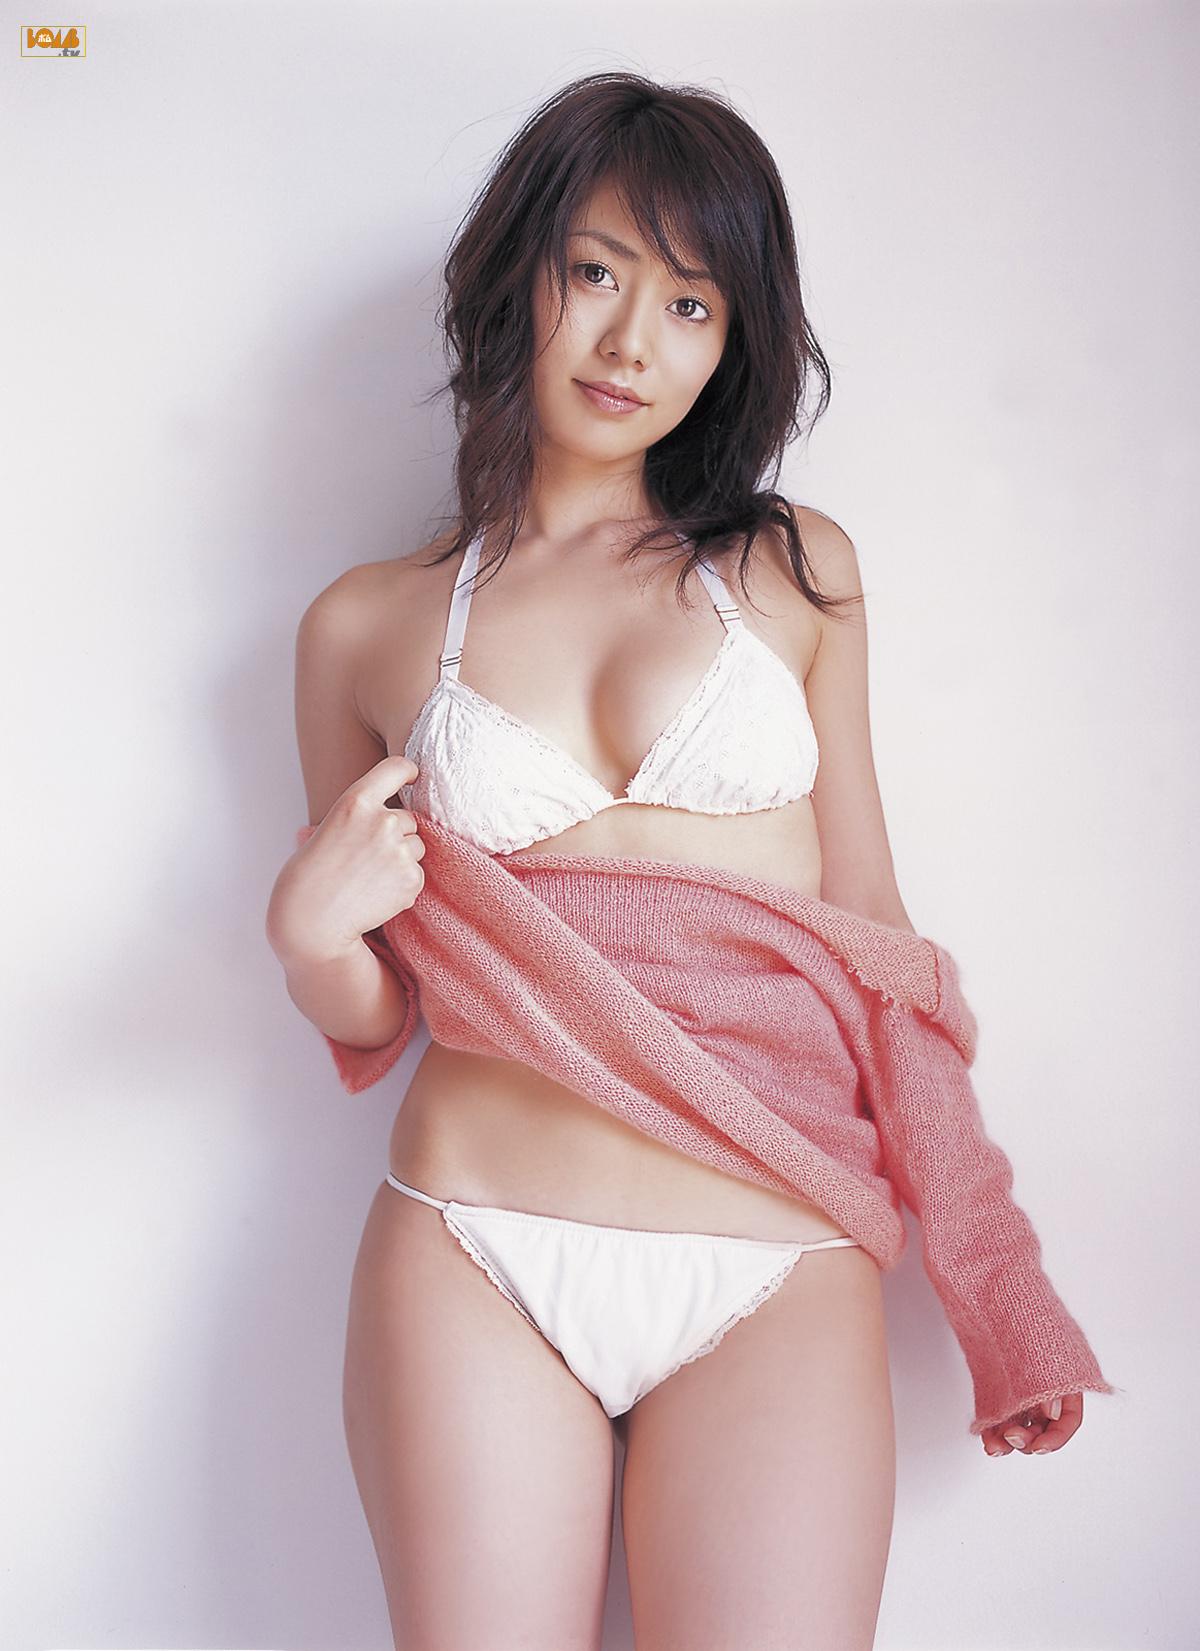 [HF/UPL] Momoko Tani - Bomb.tv 谷桃子 [2007.03][31.5 MB]